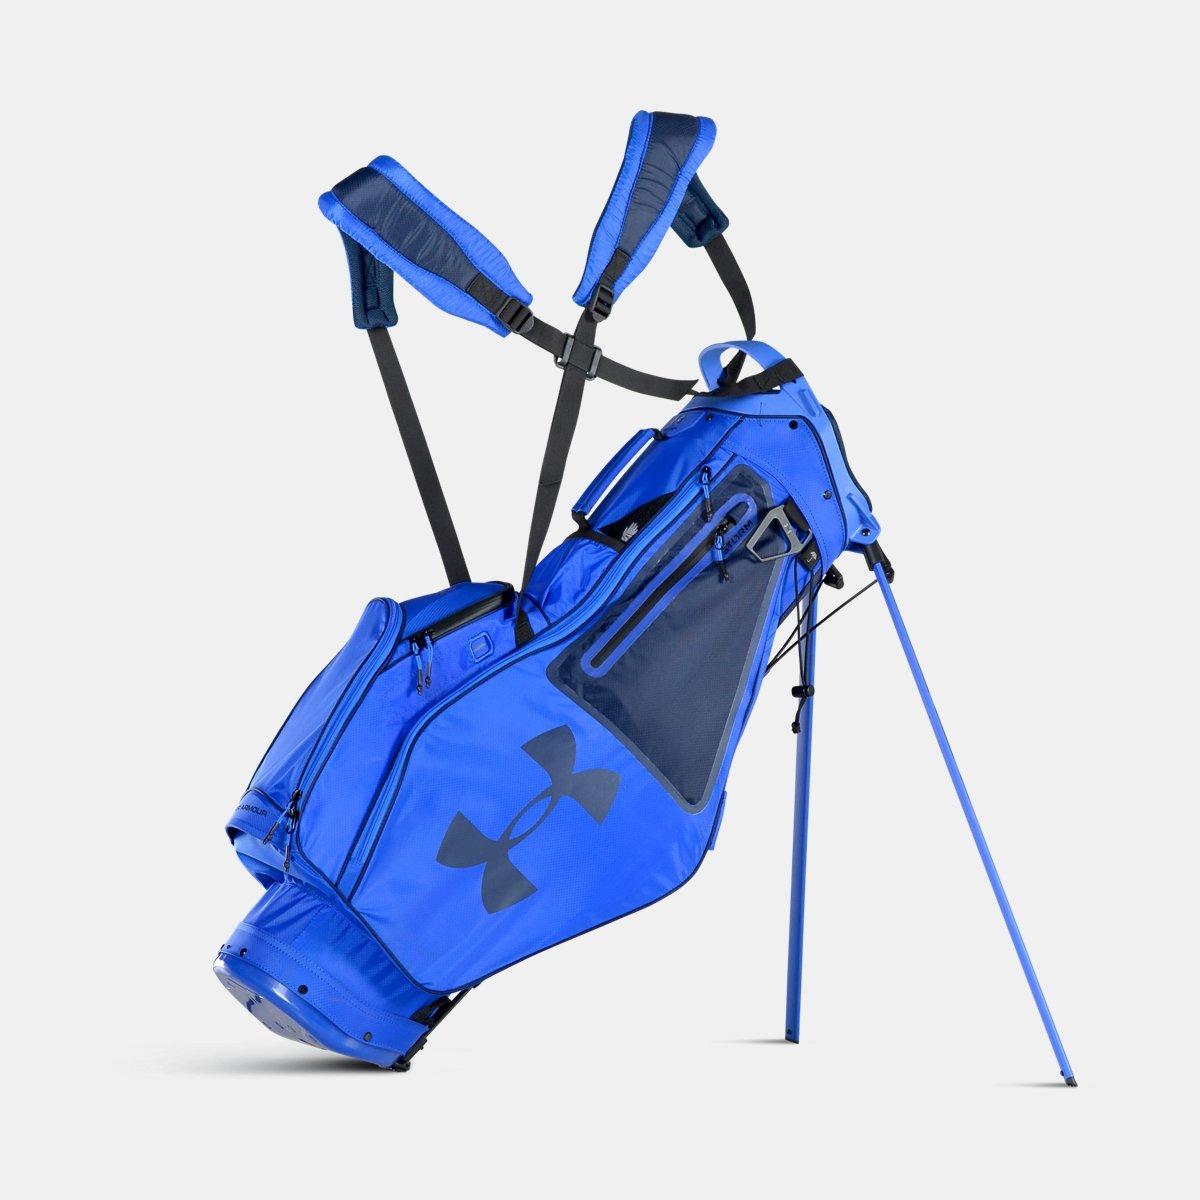 [UNDER ARMOUR] アンダーアーマー Men's UA Storm Speedround Golf Bag BLUE MARKER [並行輸入品]   B074Z4SSVS